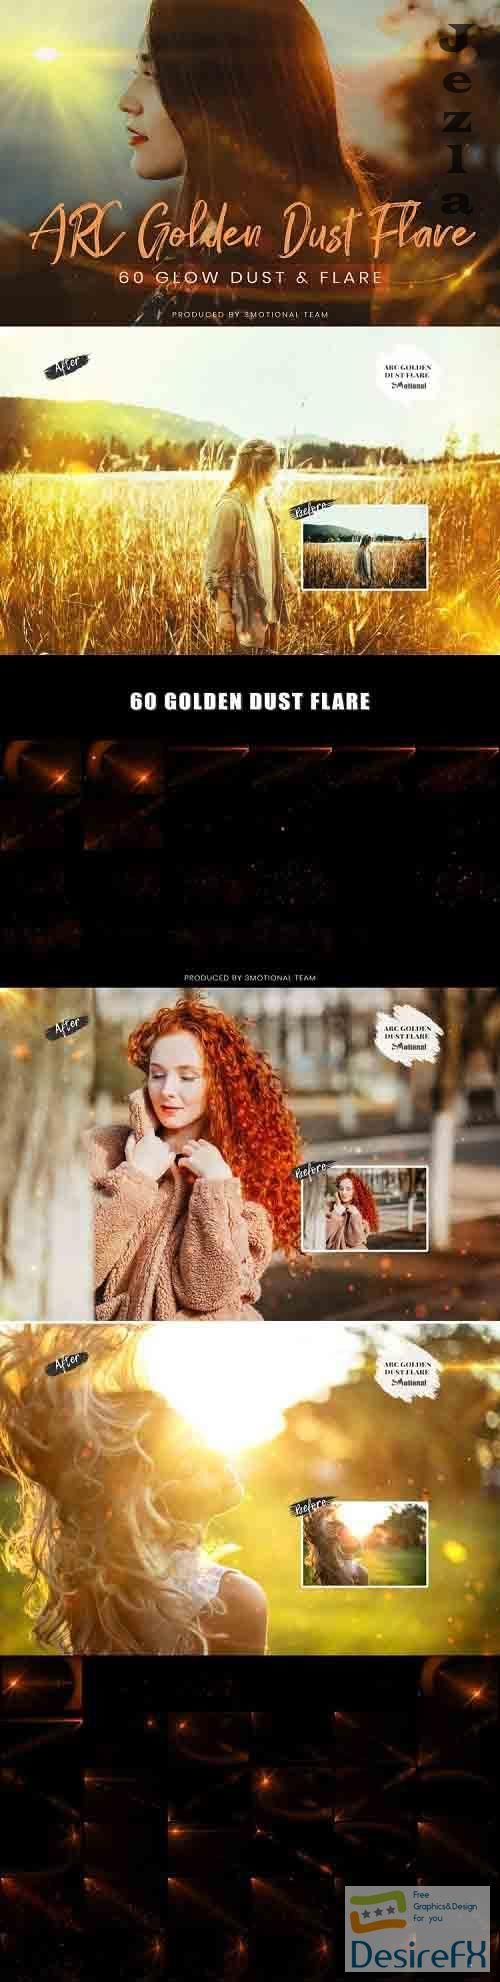 60 ARC Golden Dust Flare Effect Photo Overlays - 735158